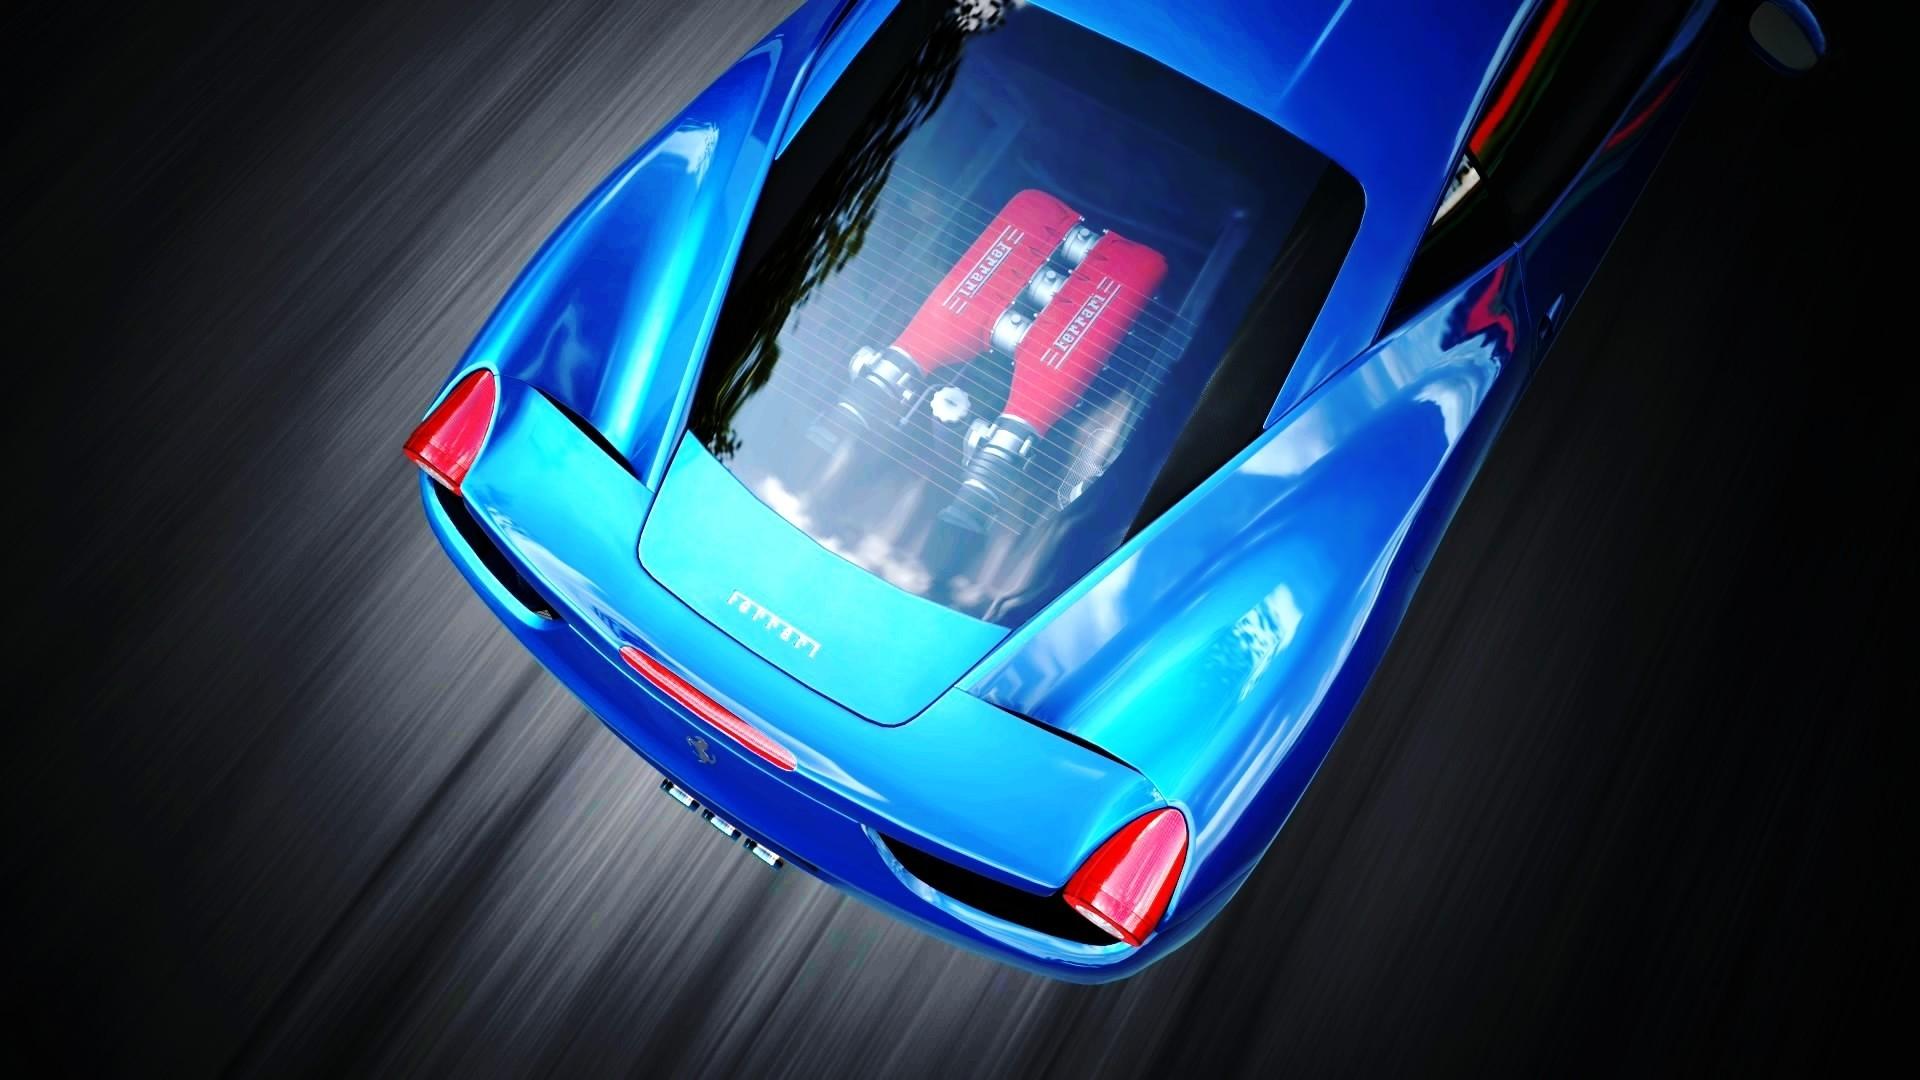 General 1920x1080 Ferrari car engines Ferrari 458 Italia blue cars vehicle